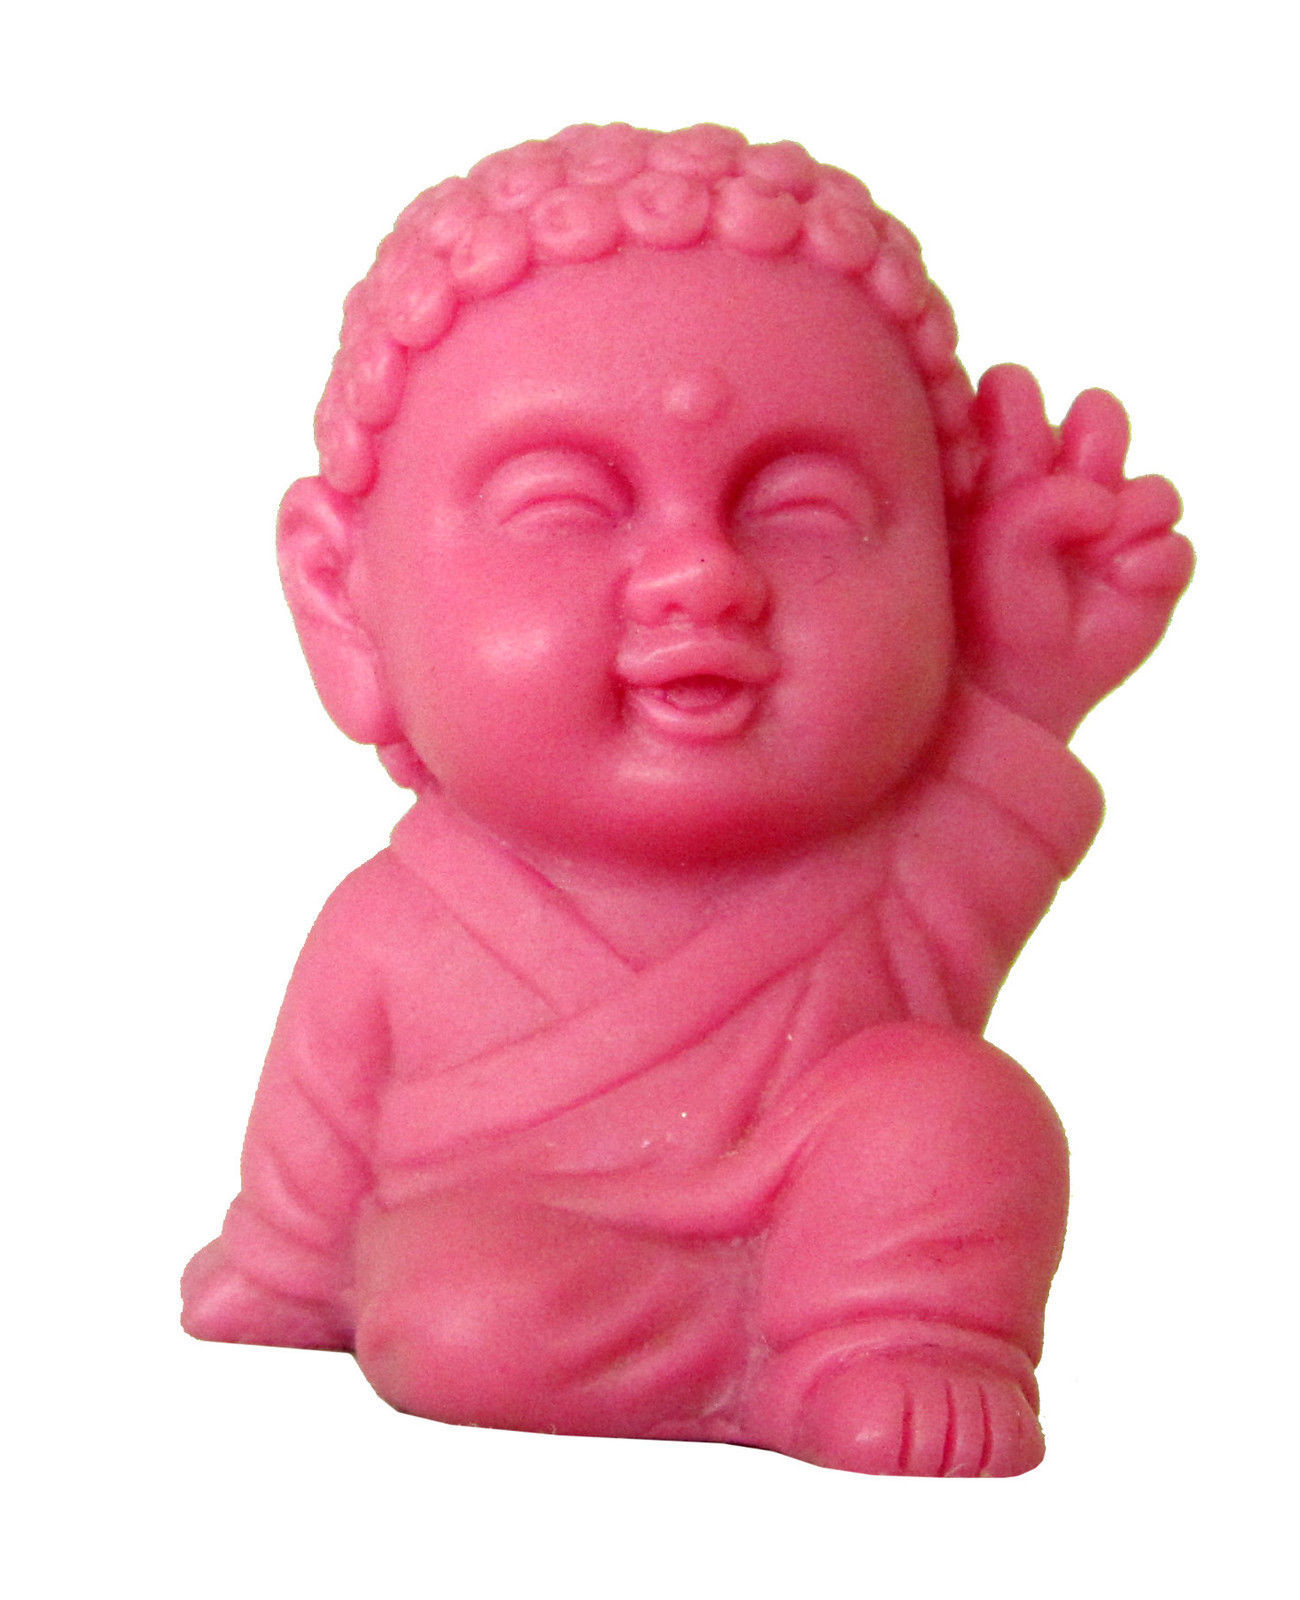 Pocket Buddha Figurine Toy Faith Peace Happiness Wisdom Love Harmony, set of 6